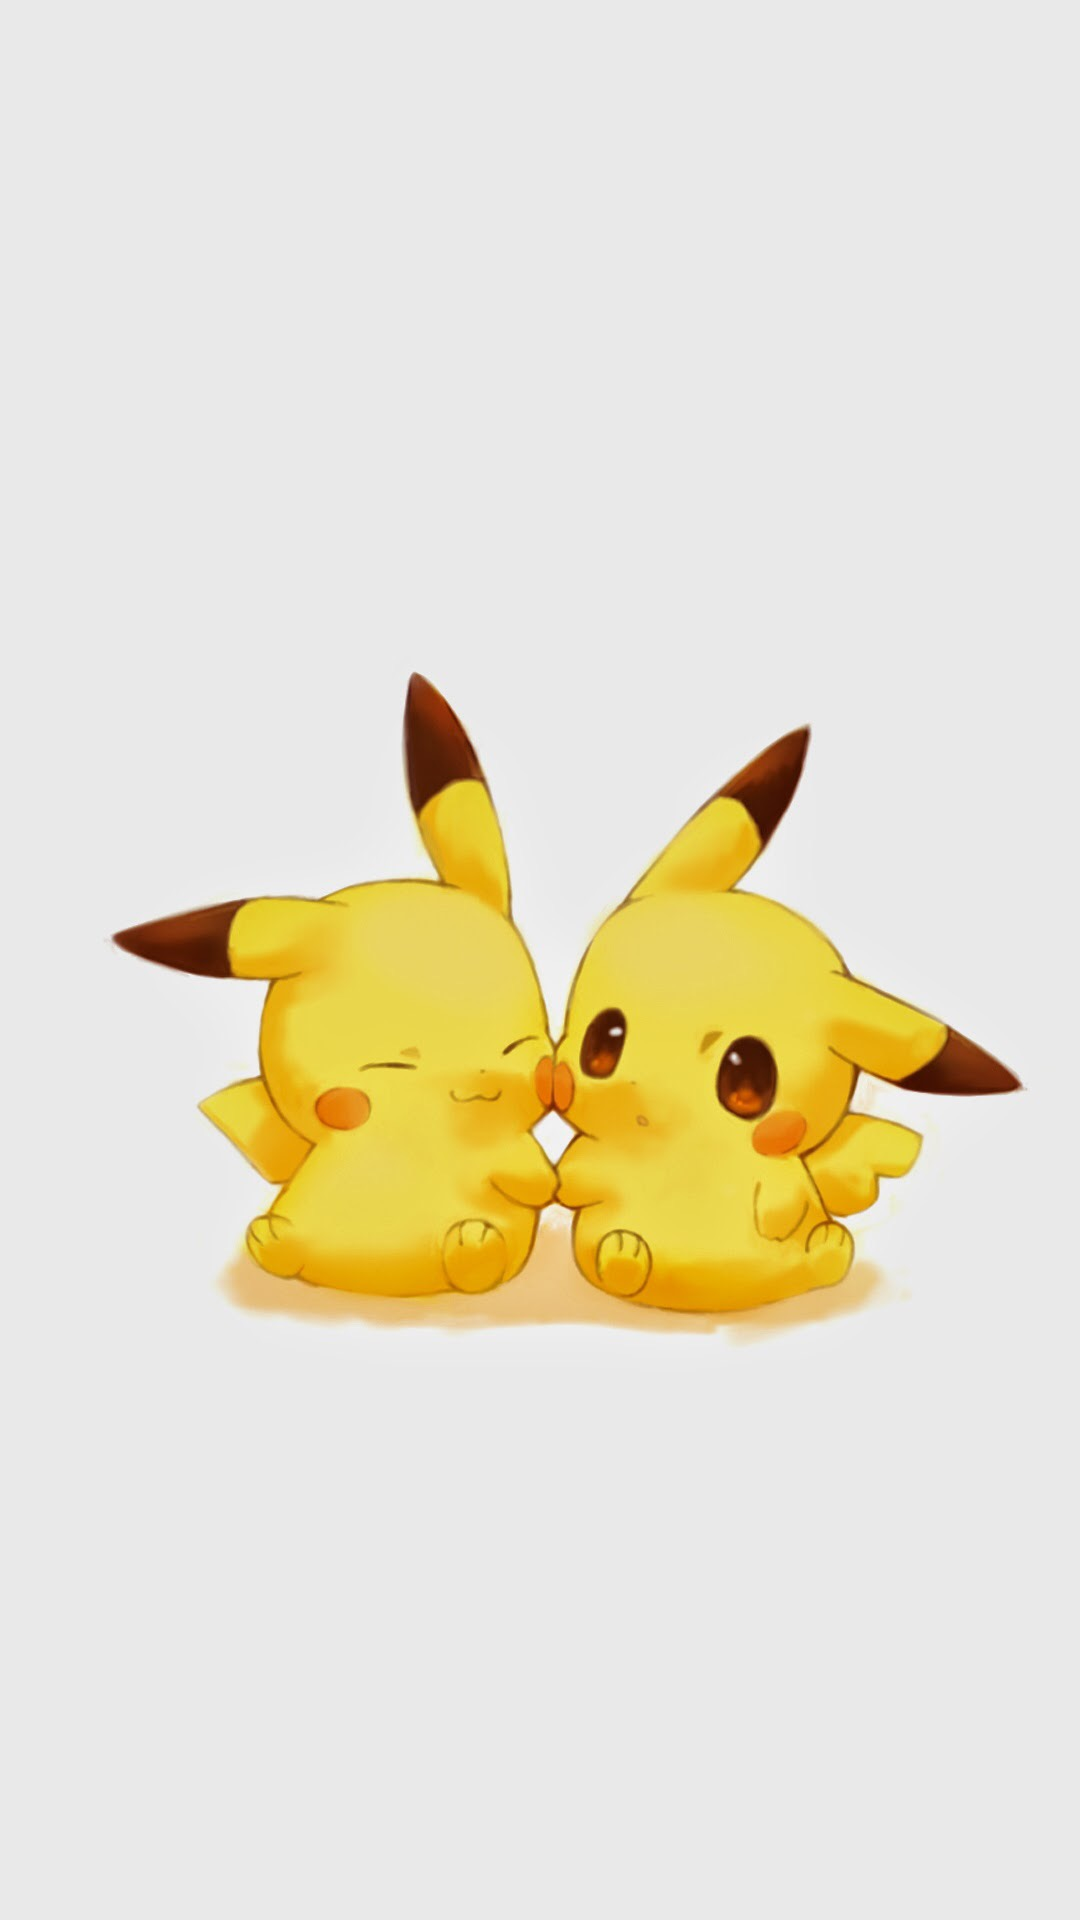 Cute Kawaii Wallpapers Mobile 4k Pikachu Wallpapers High Quality Download Free